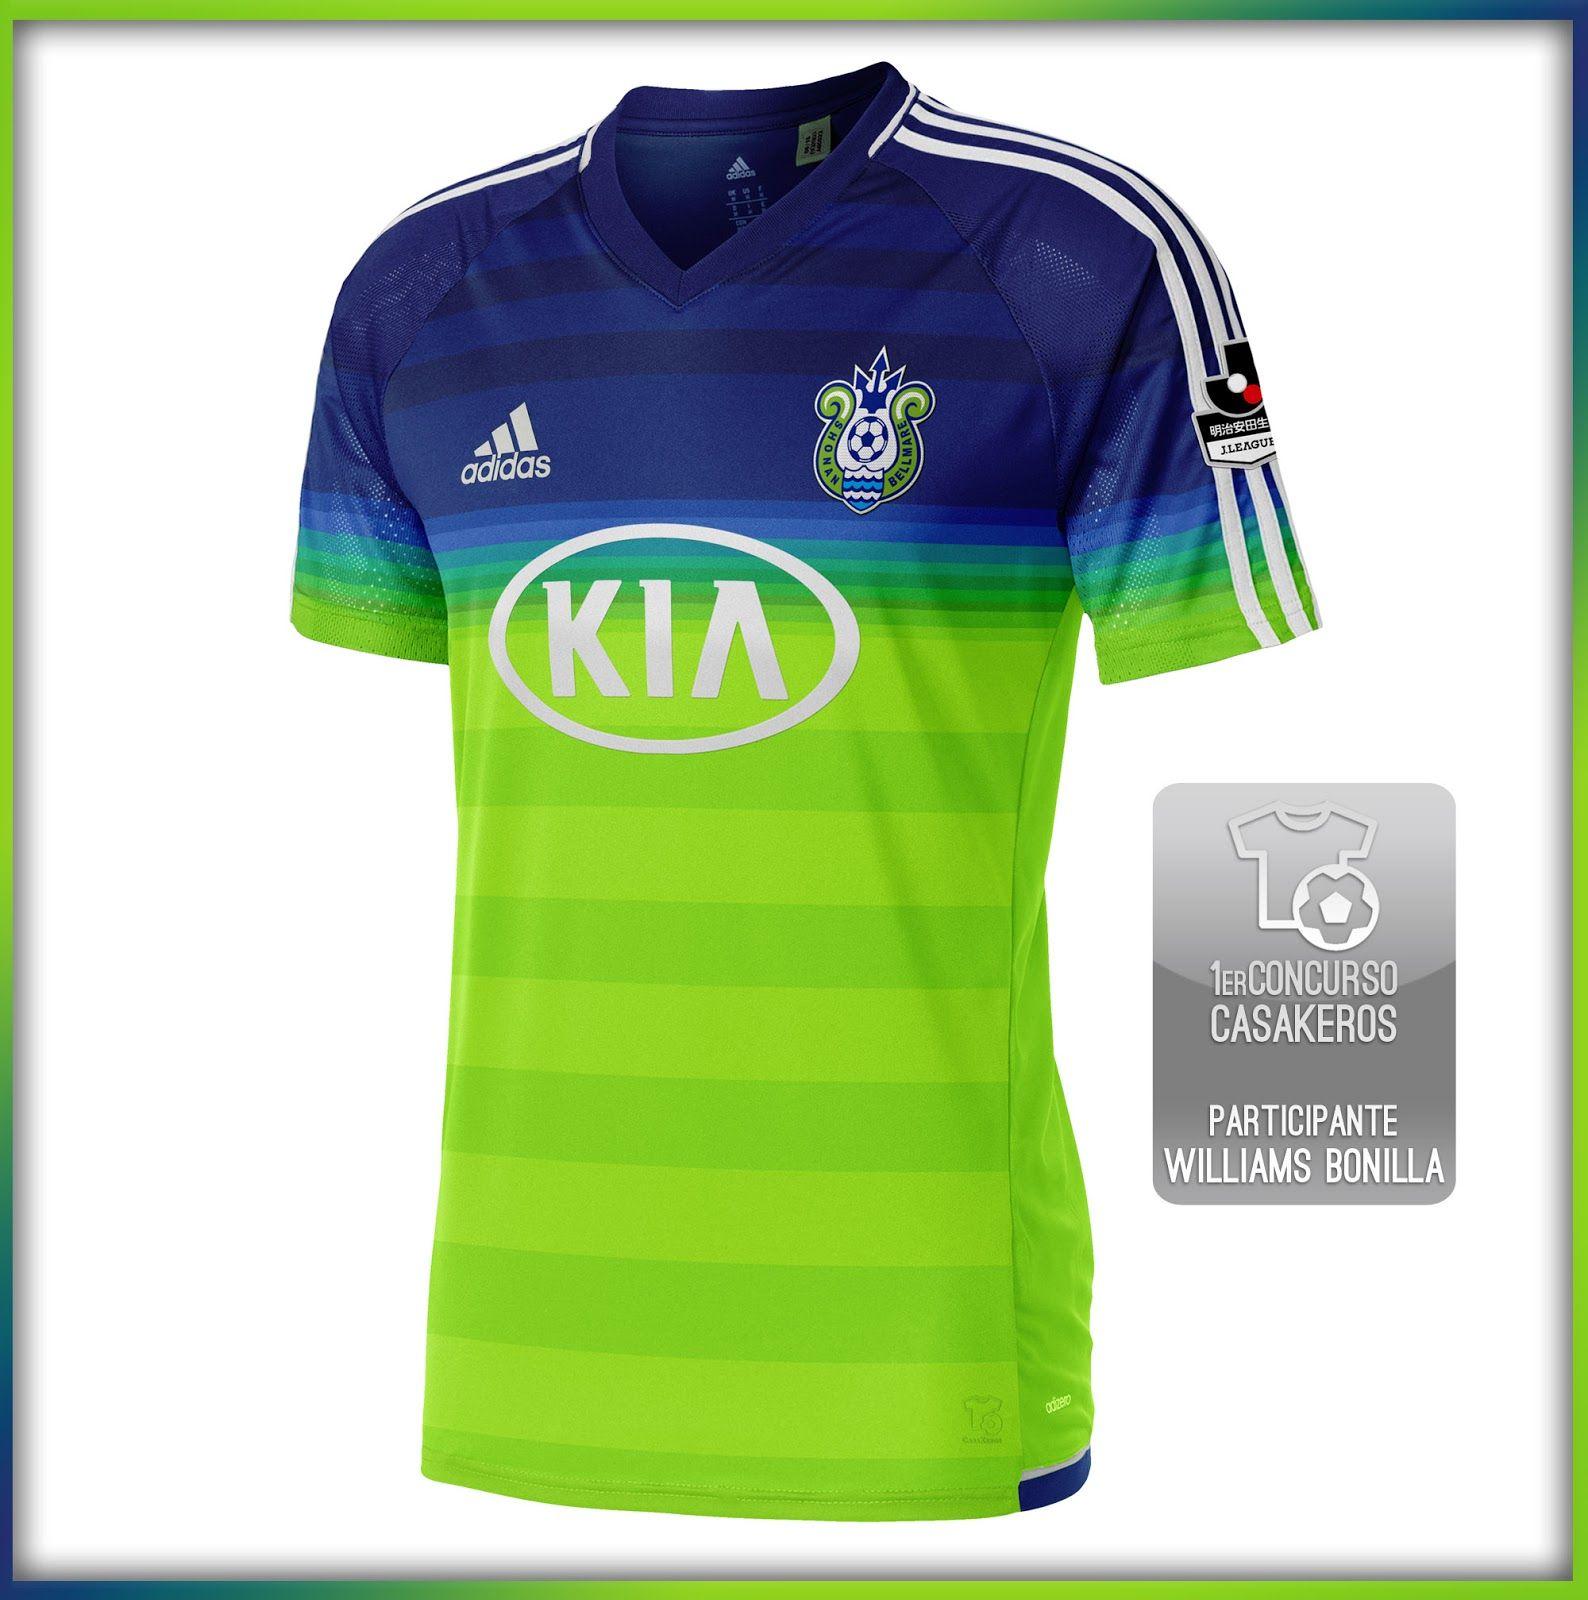 Diseño de camisetas de fútbol real o fantasy    Creamos TEMPLATES de  camisetas de fútbol    Tutoriales    Mockups    Soccer Kit Templates 15abec1289298